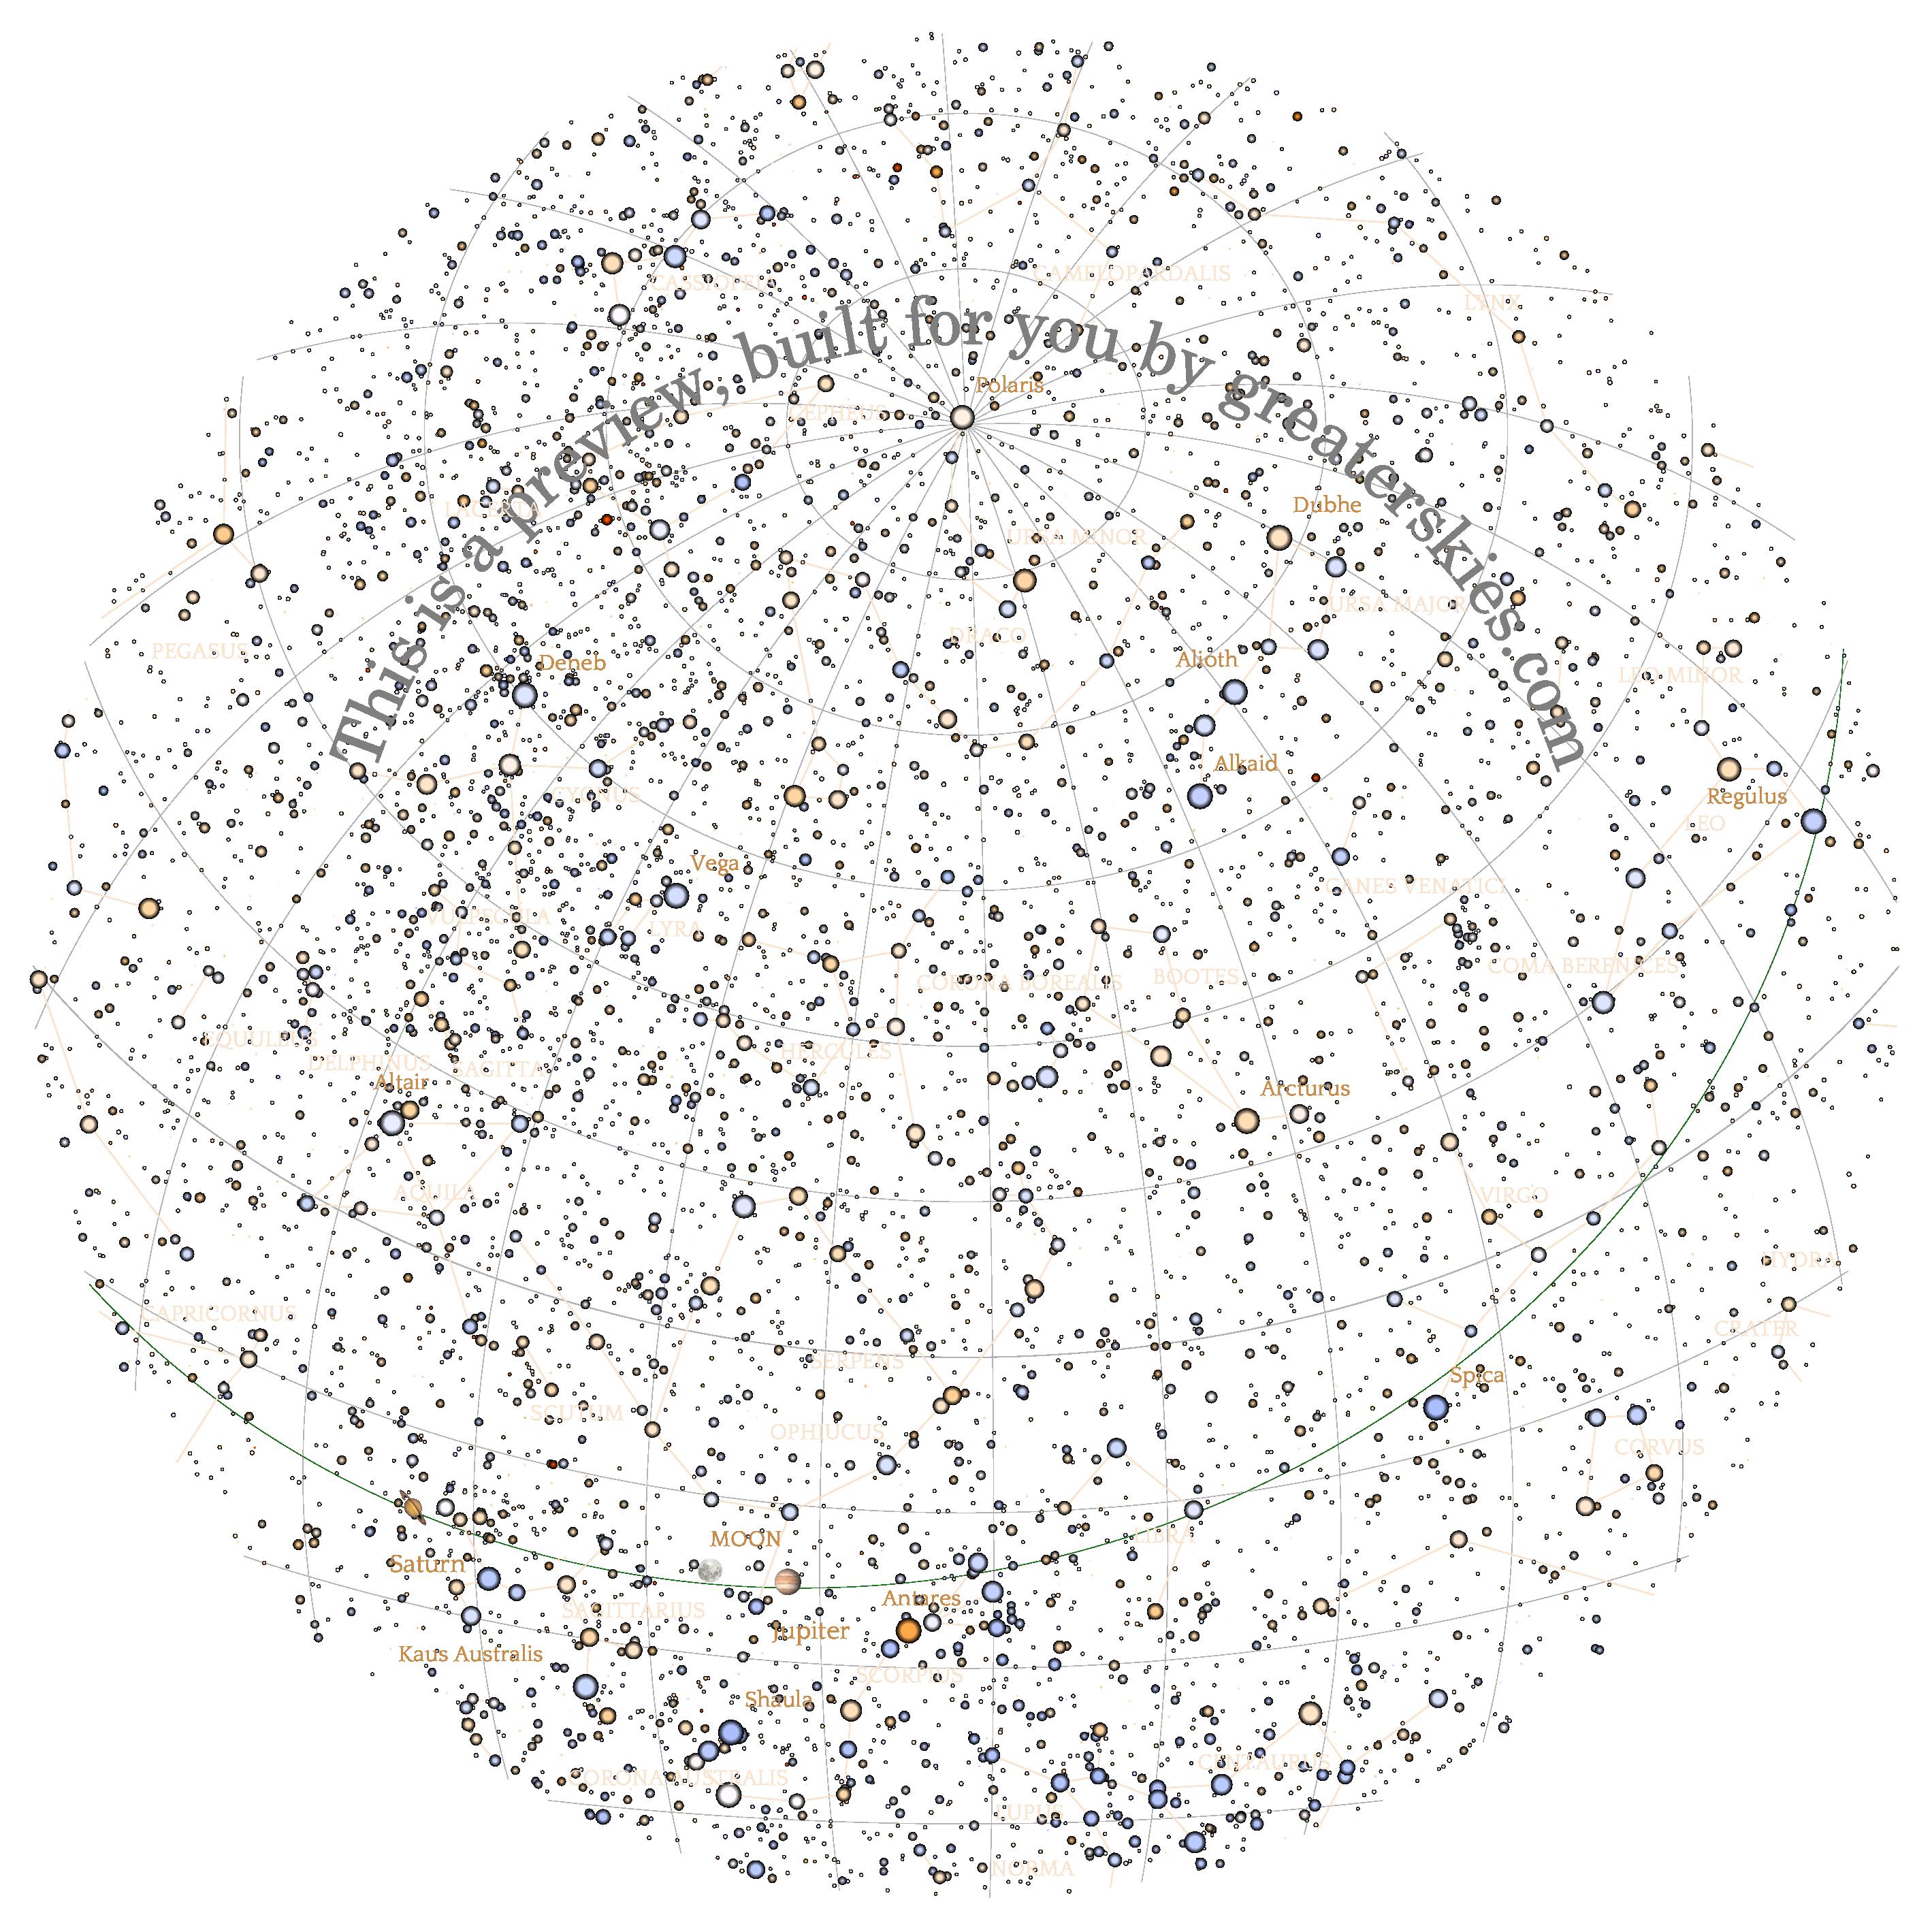 GreaterSkies - Luxury custom star map download and print